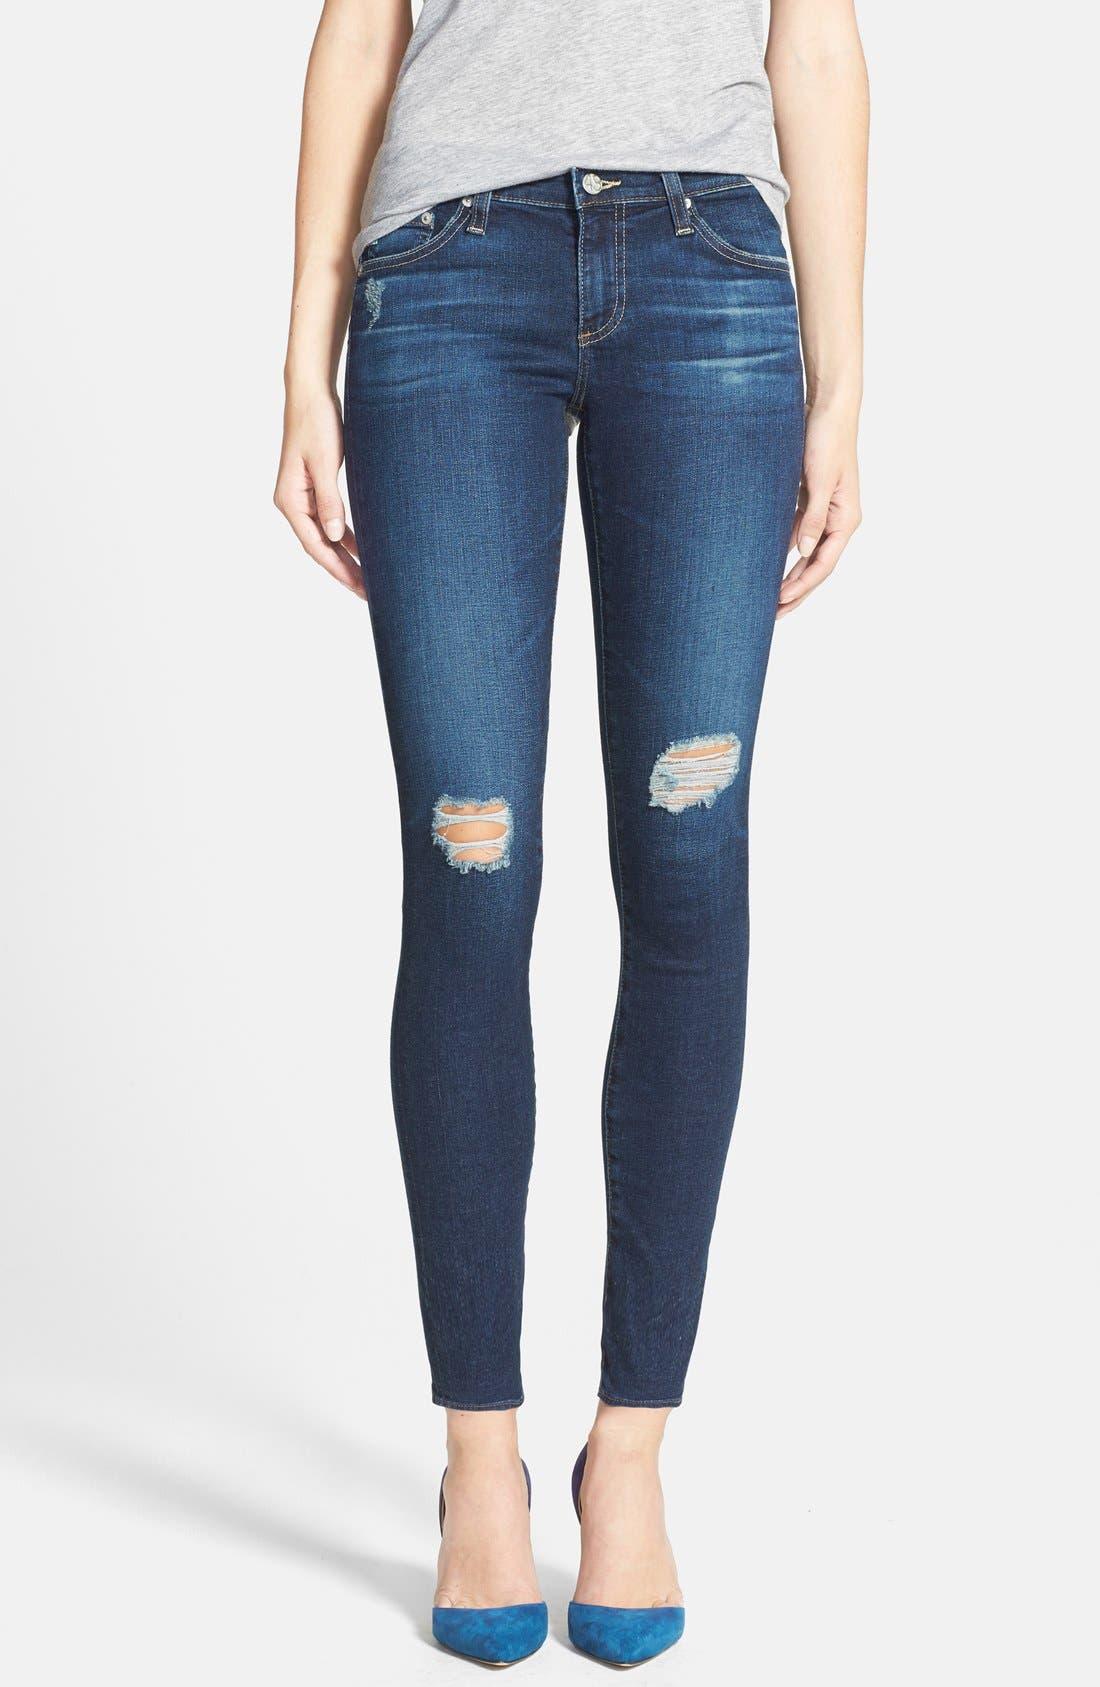 Alternate Image 1 Selected - AG 'The Legging' Ankle Jeans (4 Year Fog)